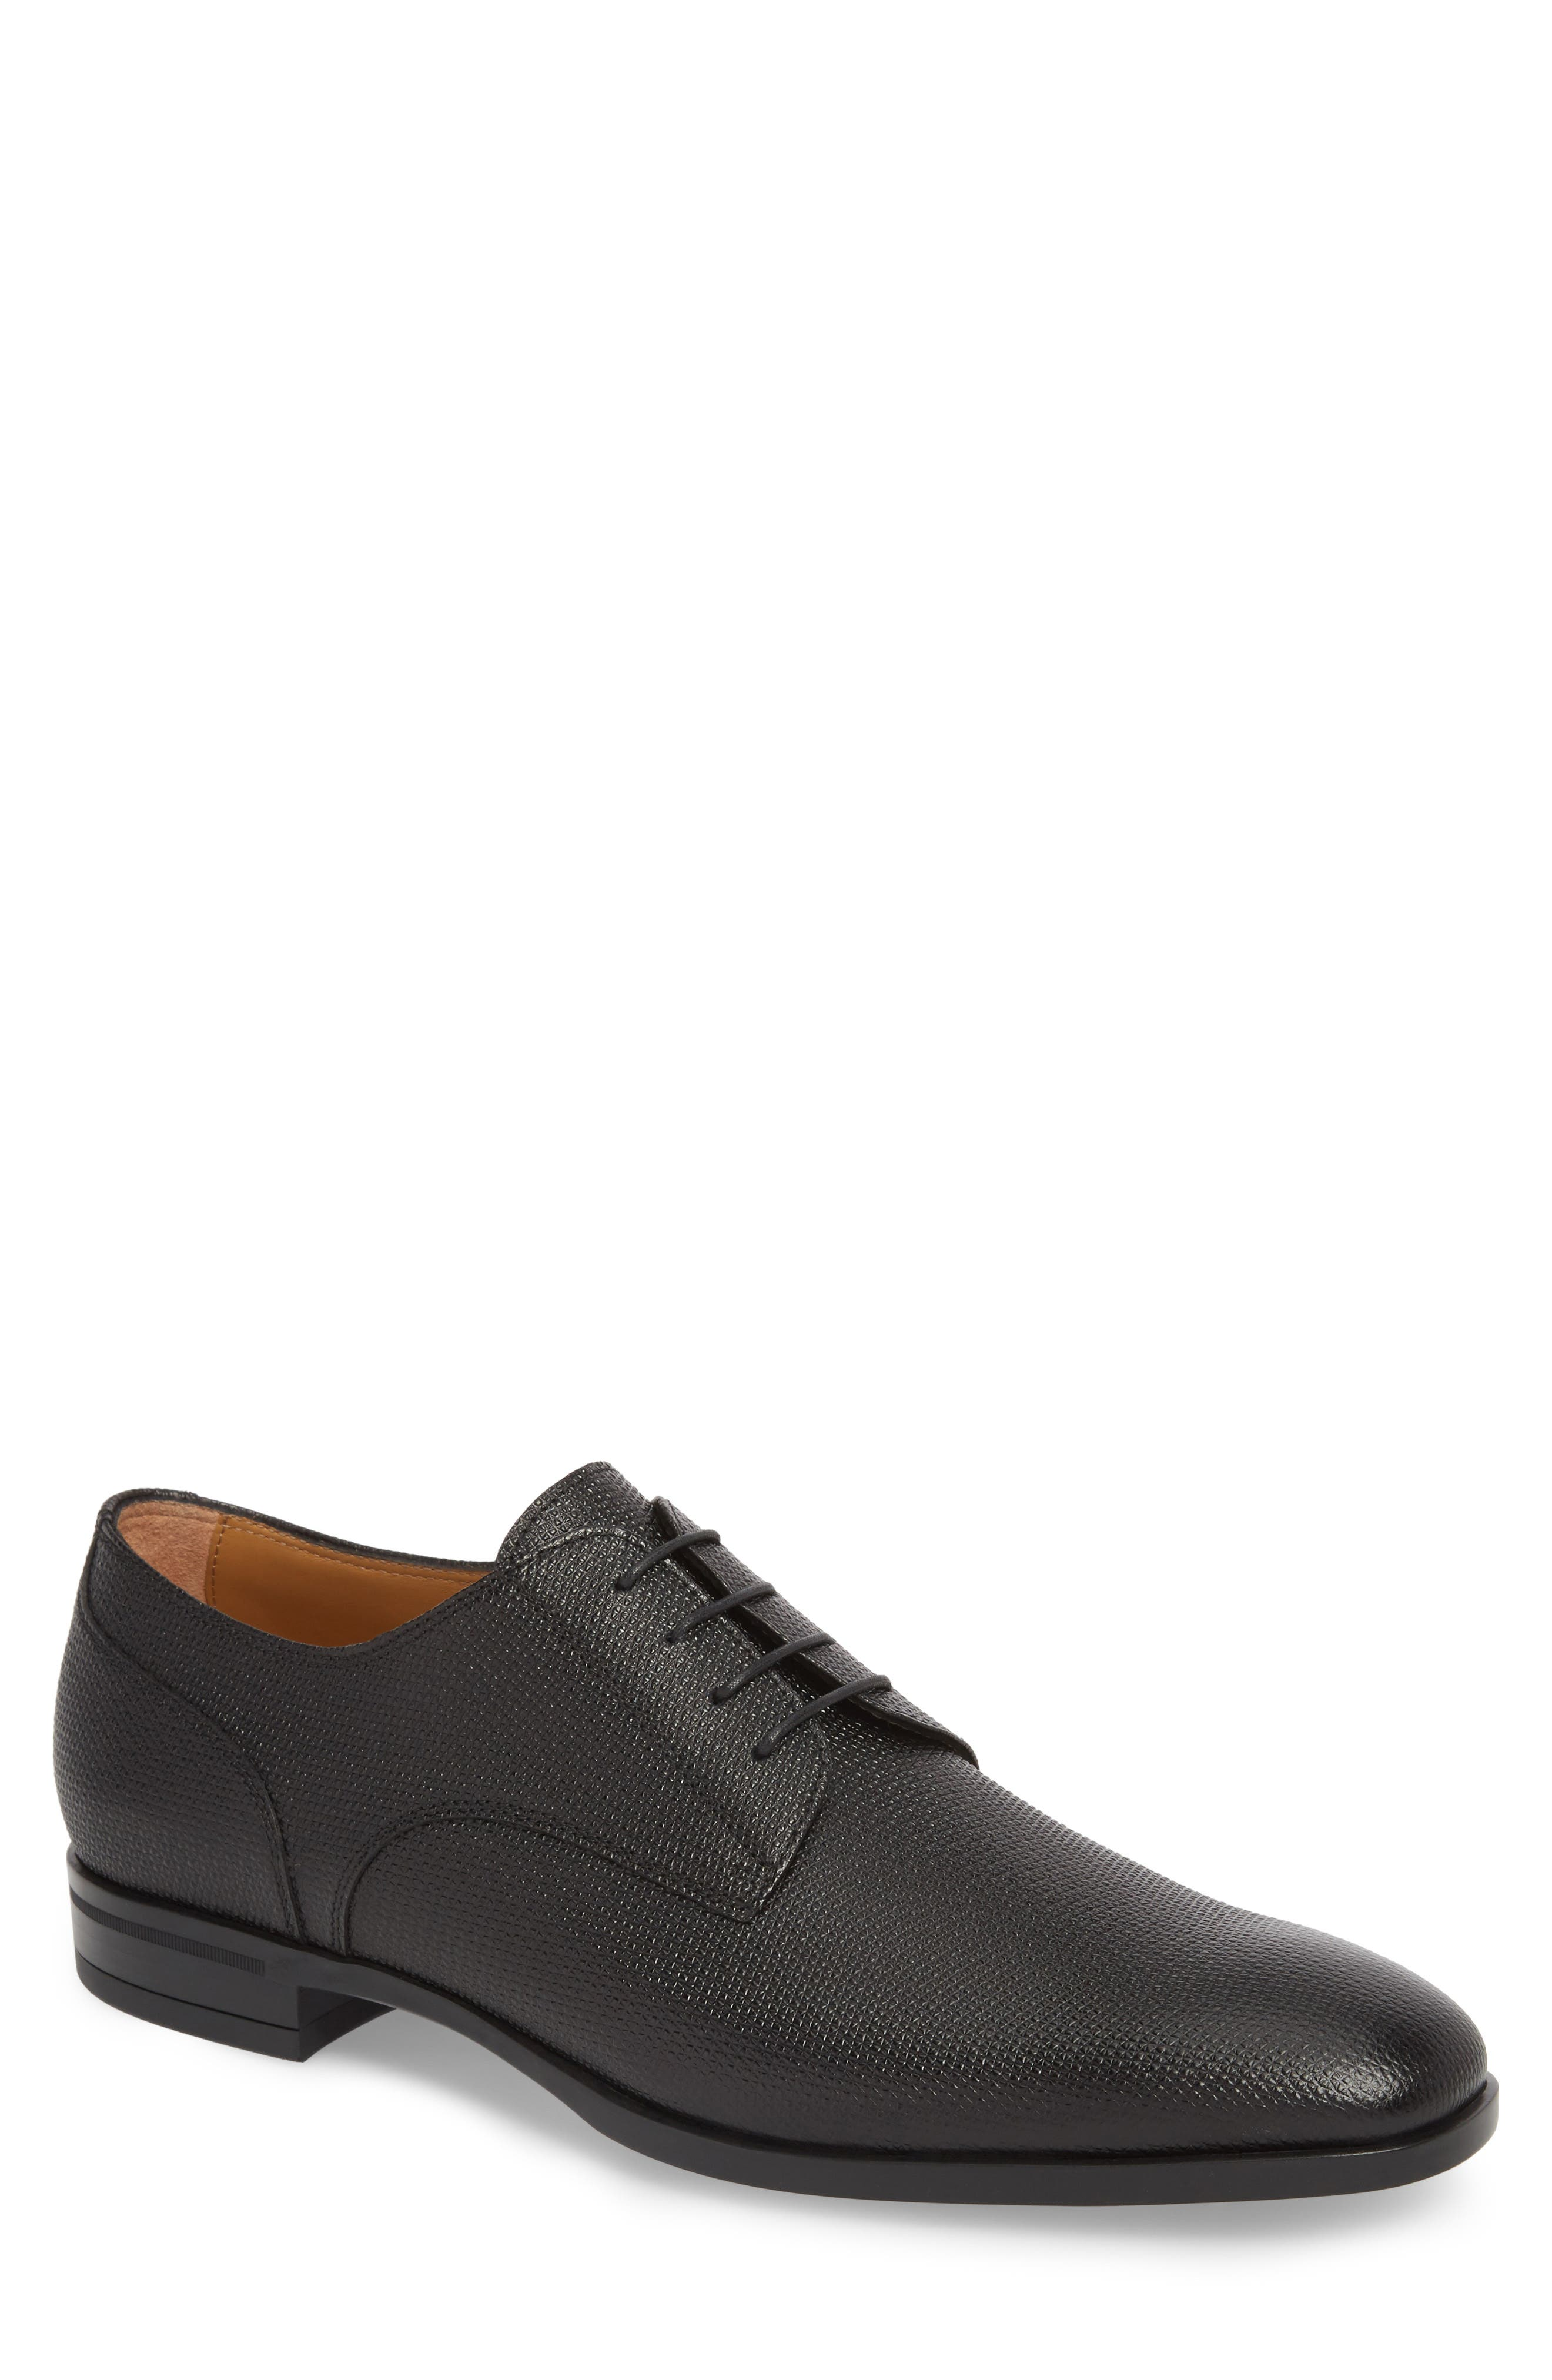 Hugo Boss Portland Embossed Plain Toe Derby,                             Main thumbnail 1, color,                             BLACK LEATHER